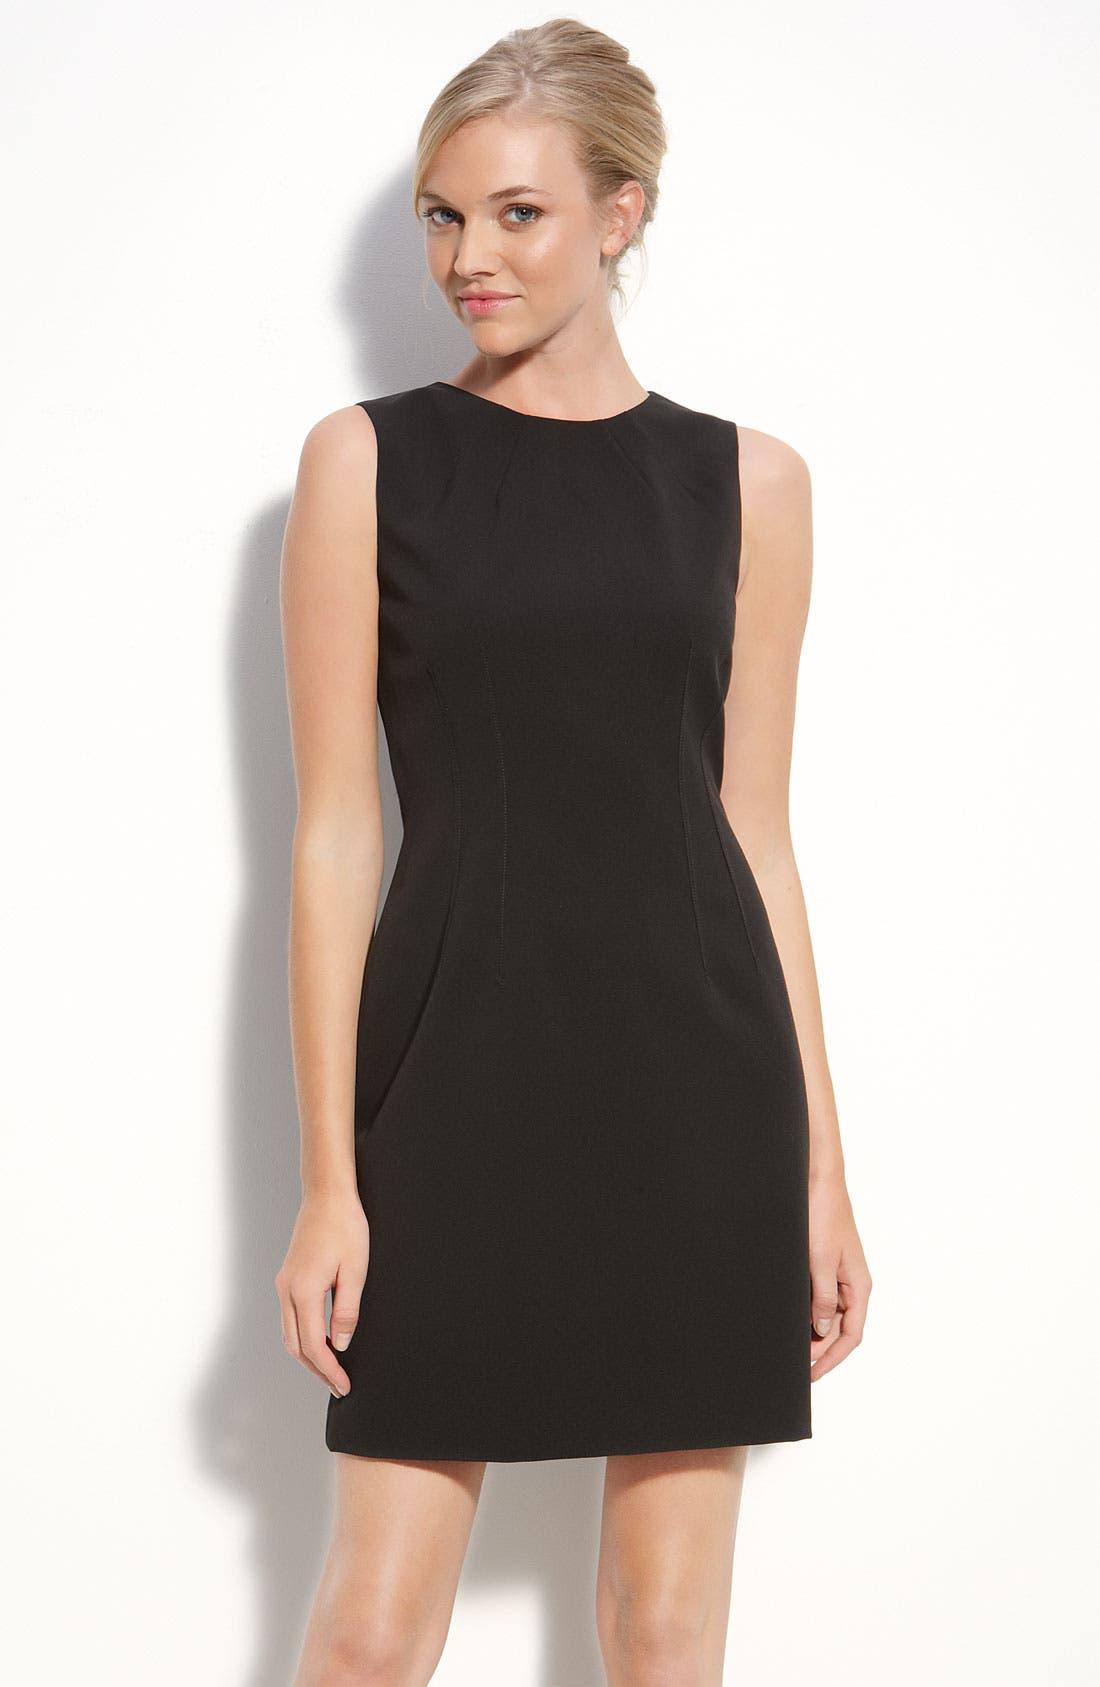 Alternate Image 1 Selected - T Tahari 'Dakota' Sheath Dress (Petite)